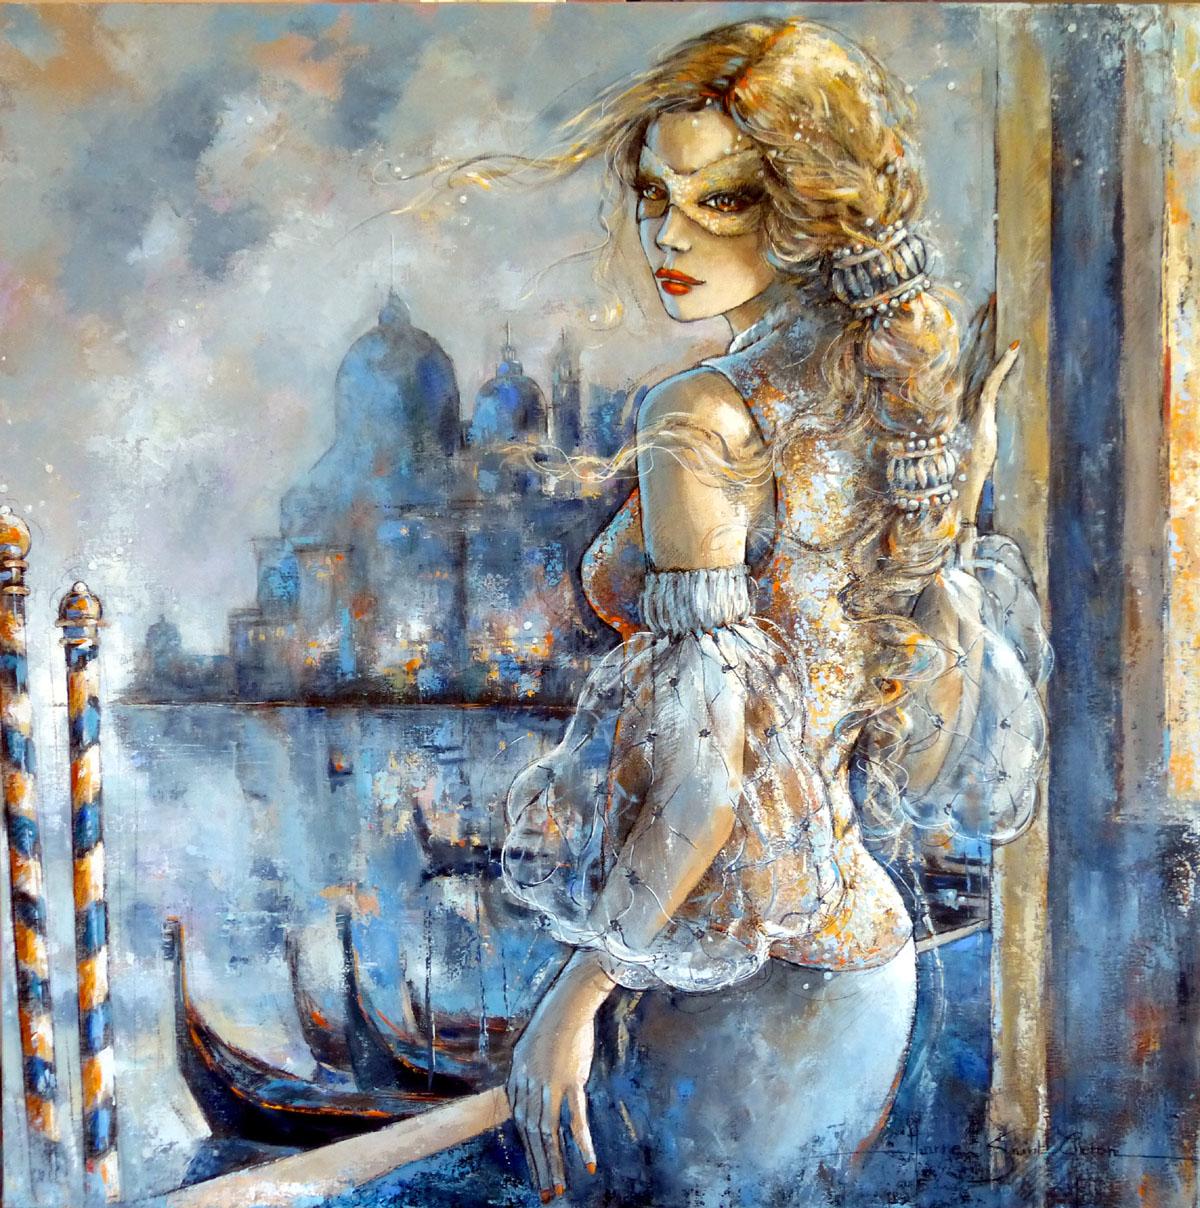 painting artwork woman